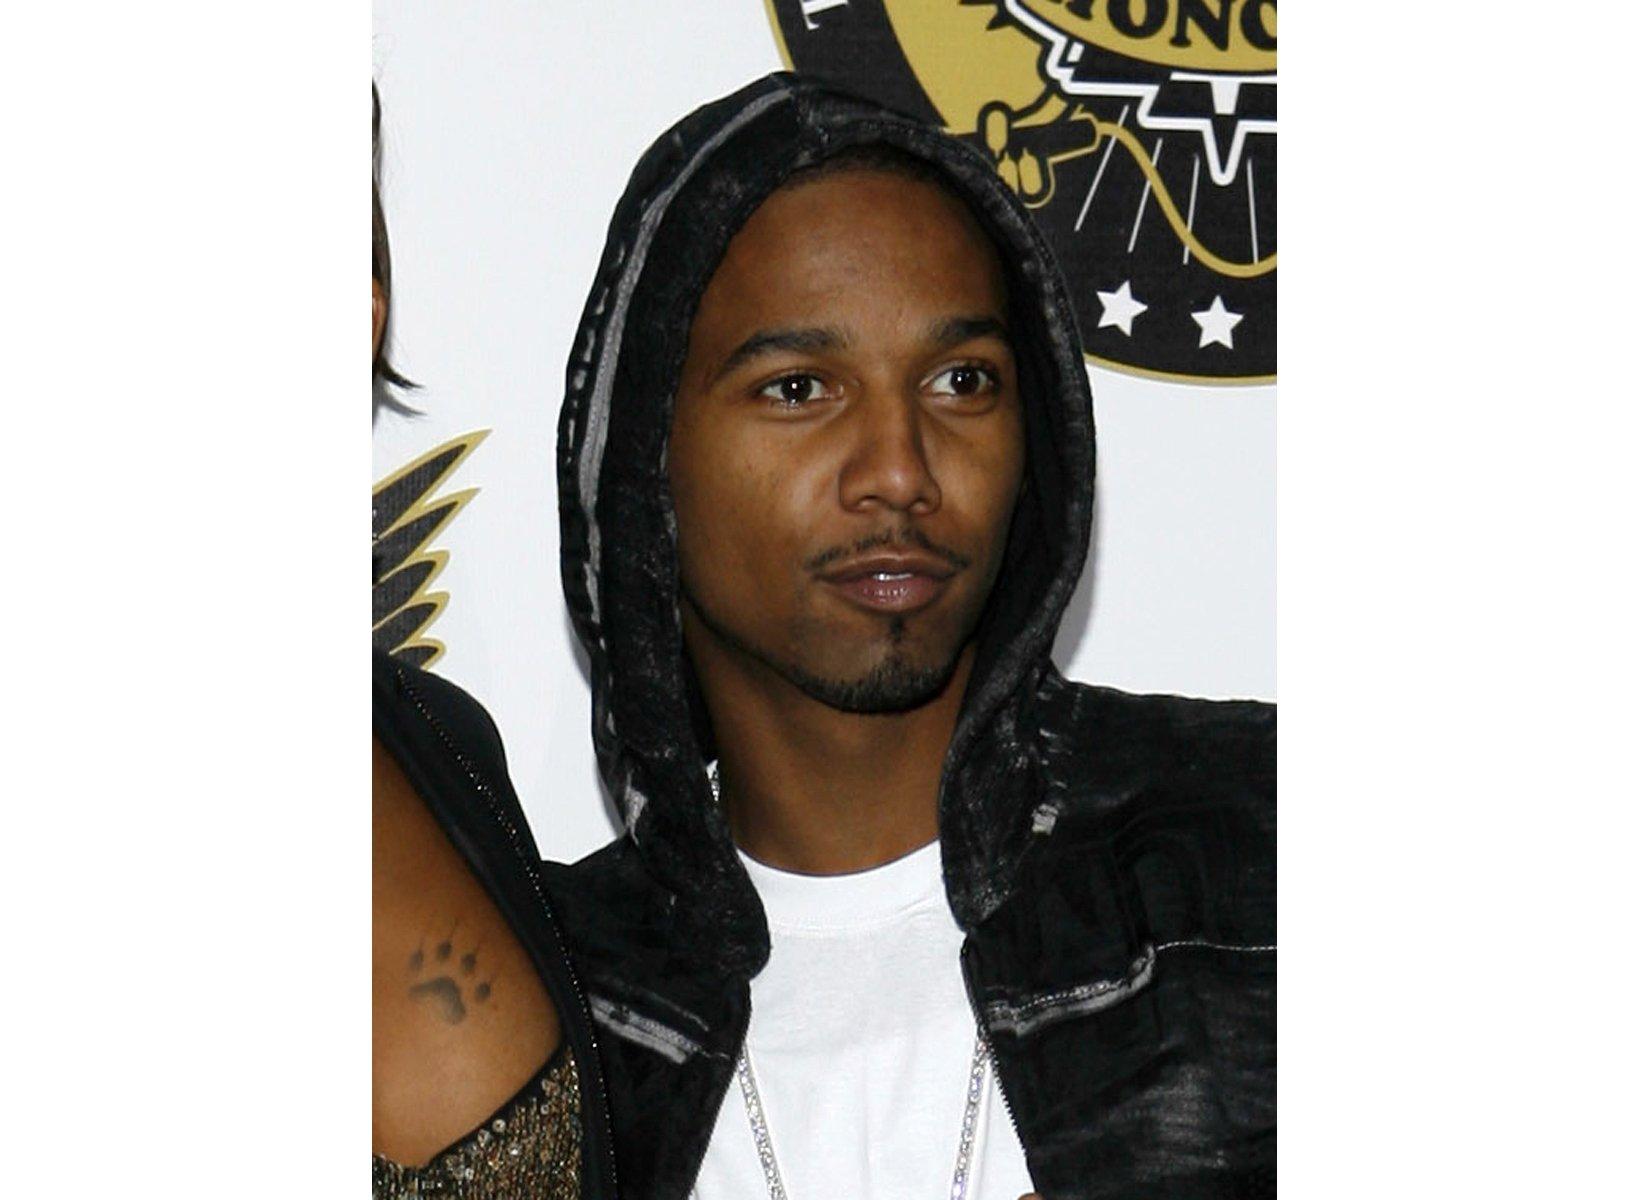 Rapper Juelz Santana sentenced to prison for gun in airport